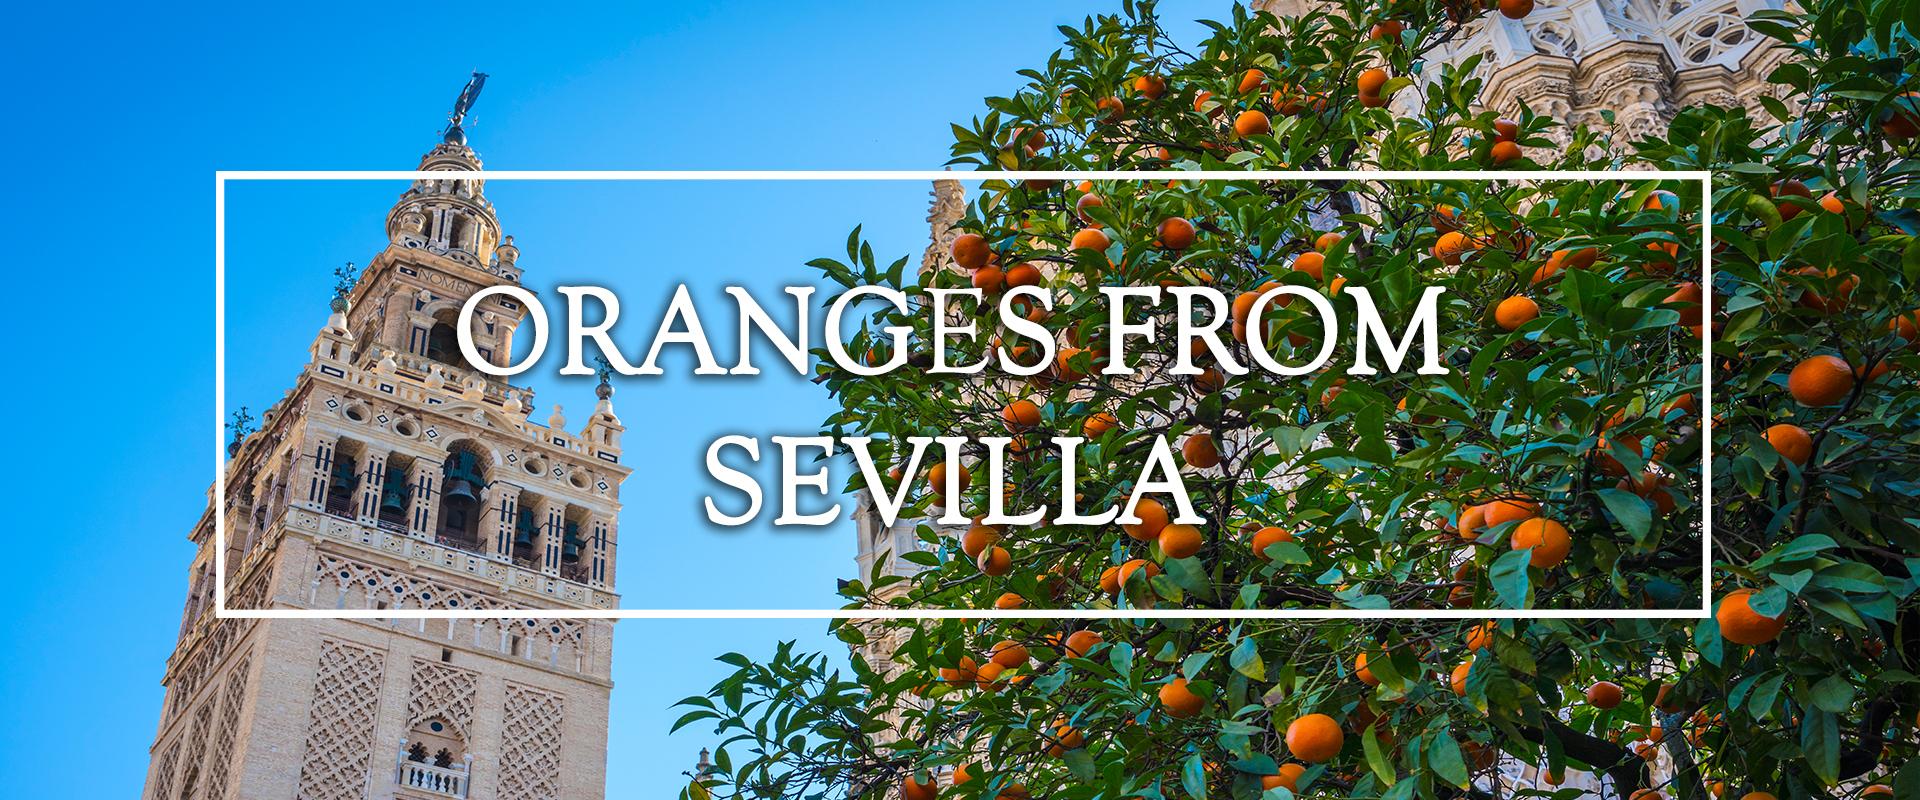 perlola oranges from sevilla